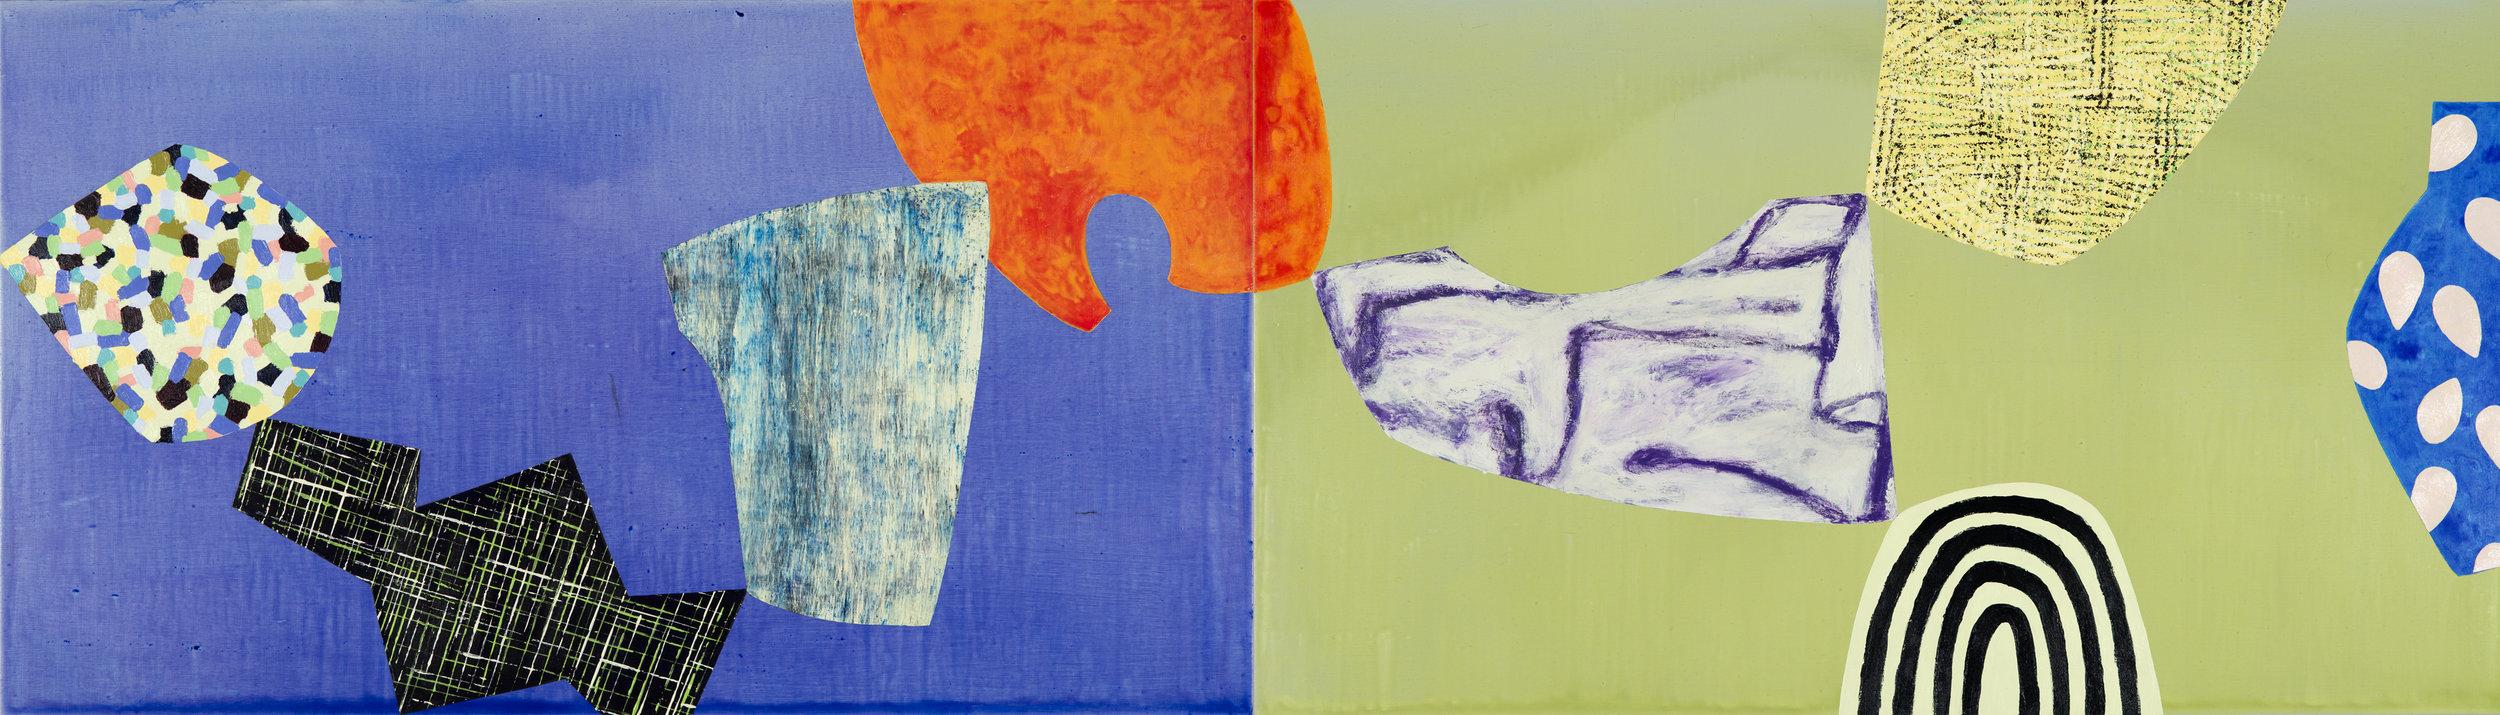 "Modern Dance / 3   Jerrold Burchman  BU290  Acrylic on Wooden Panel  24"" x 48"""